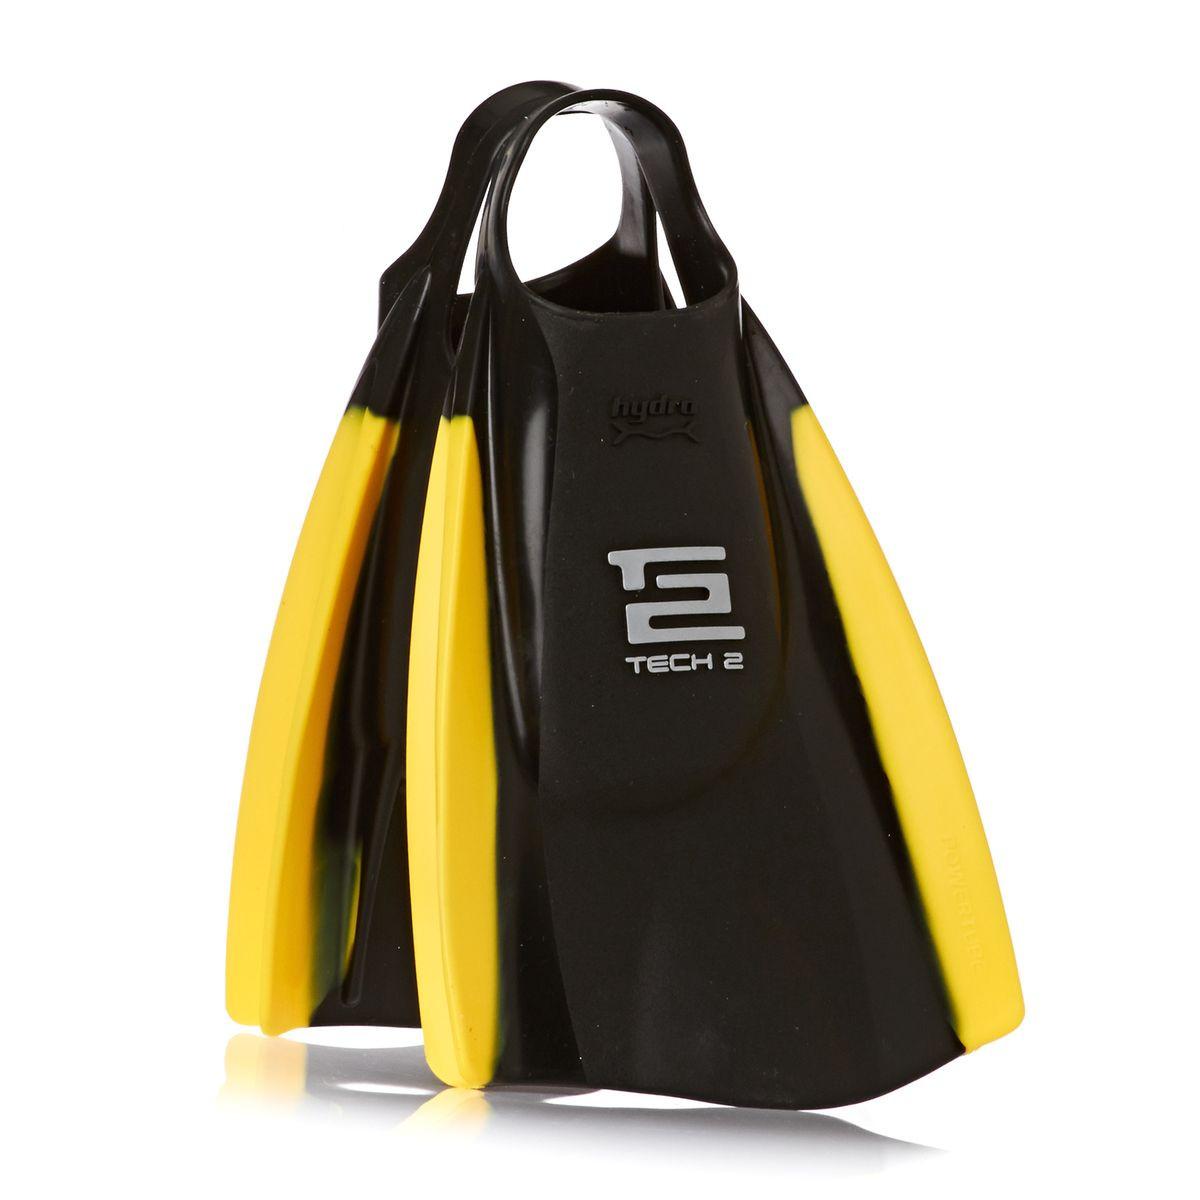 Hydro Tech 2 Bodyboard Fins - Black/ Yellow